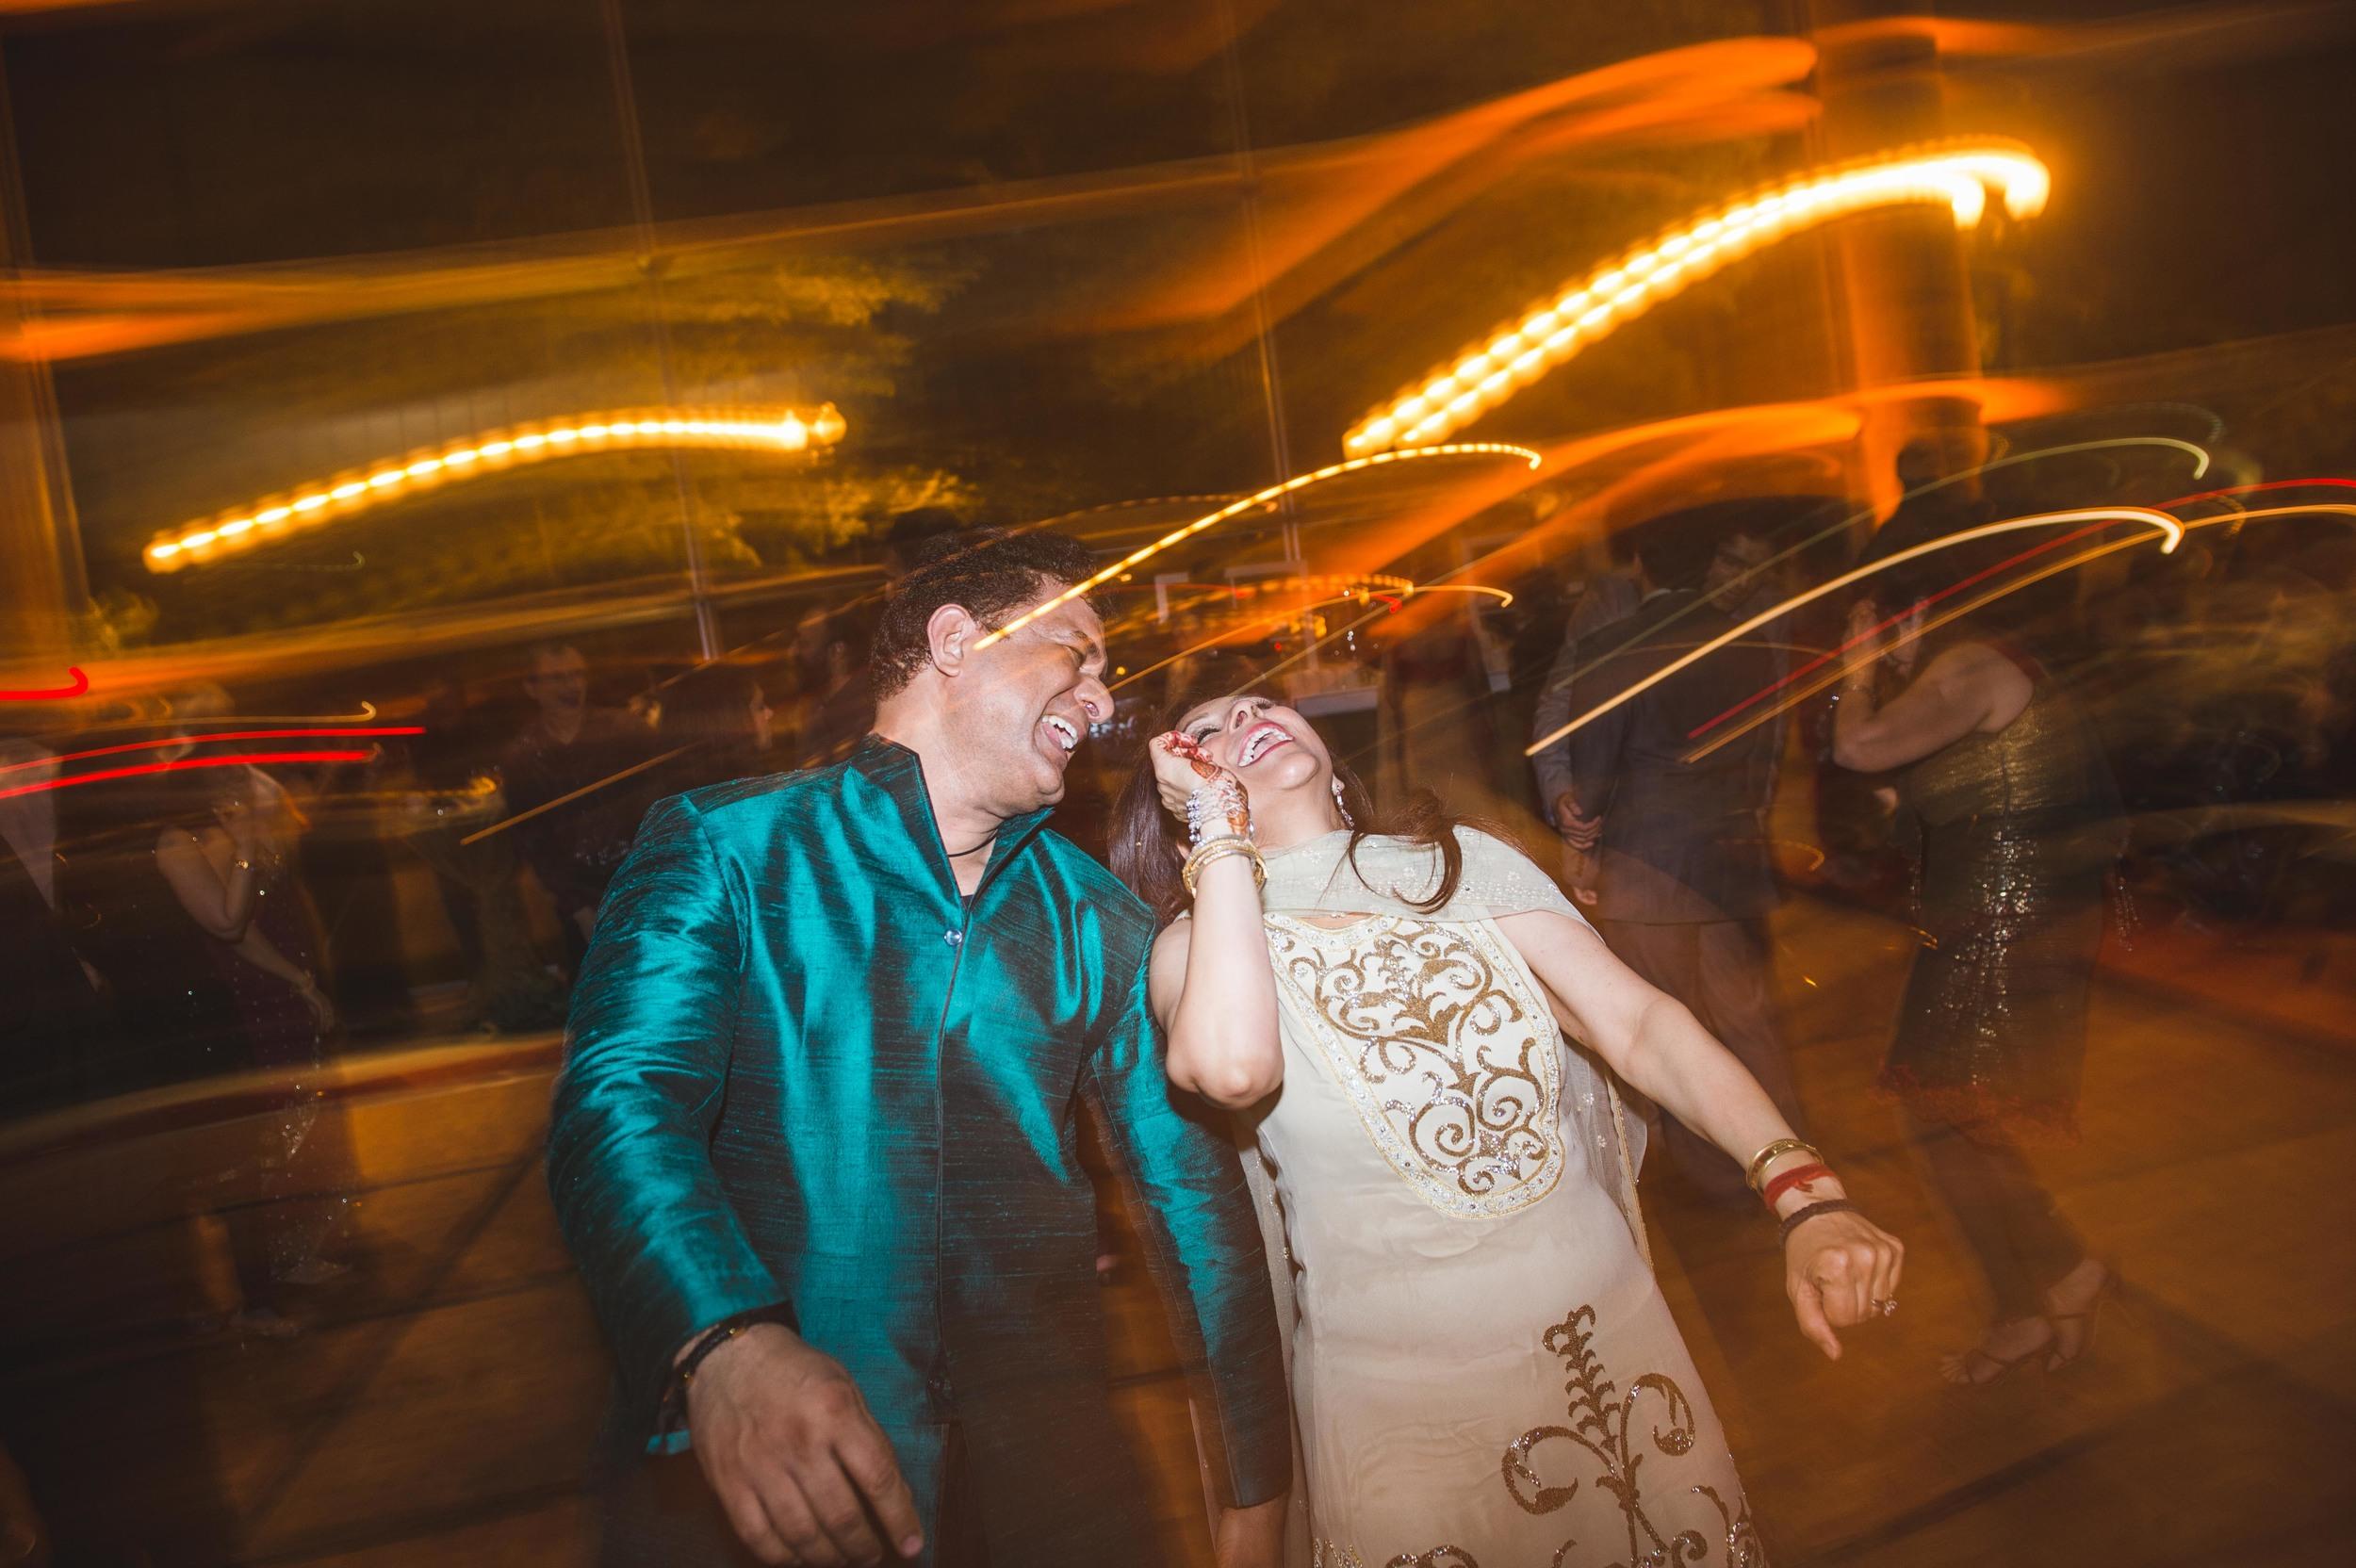 Indian Pre-wedding  at Arena Stage Washington DC by Mantas Kubilinskas-30.jpg